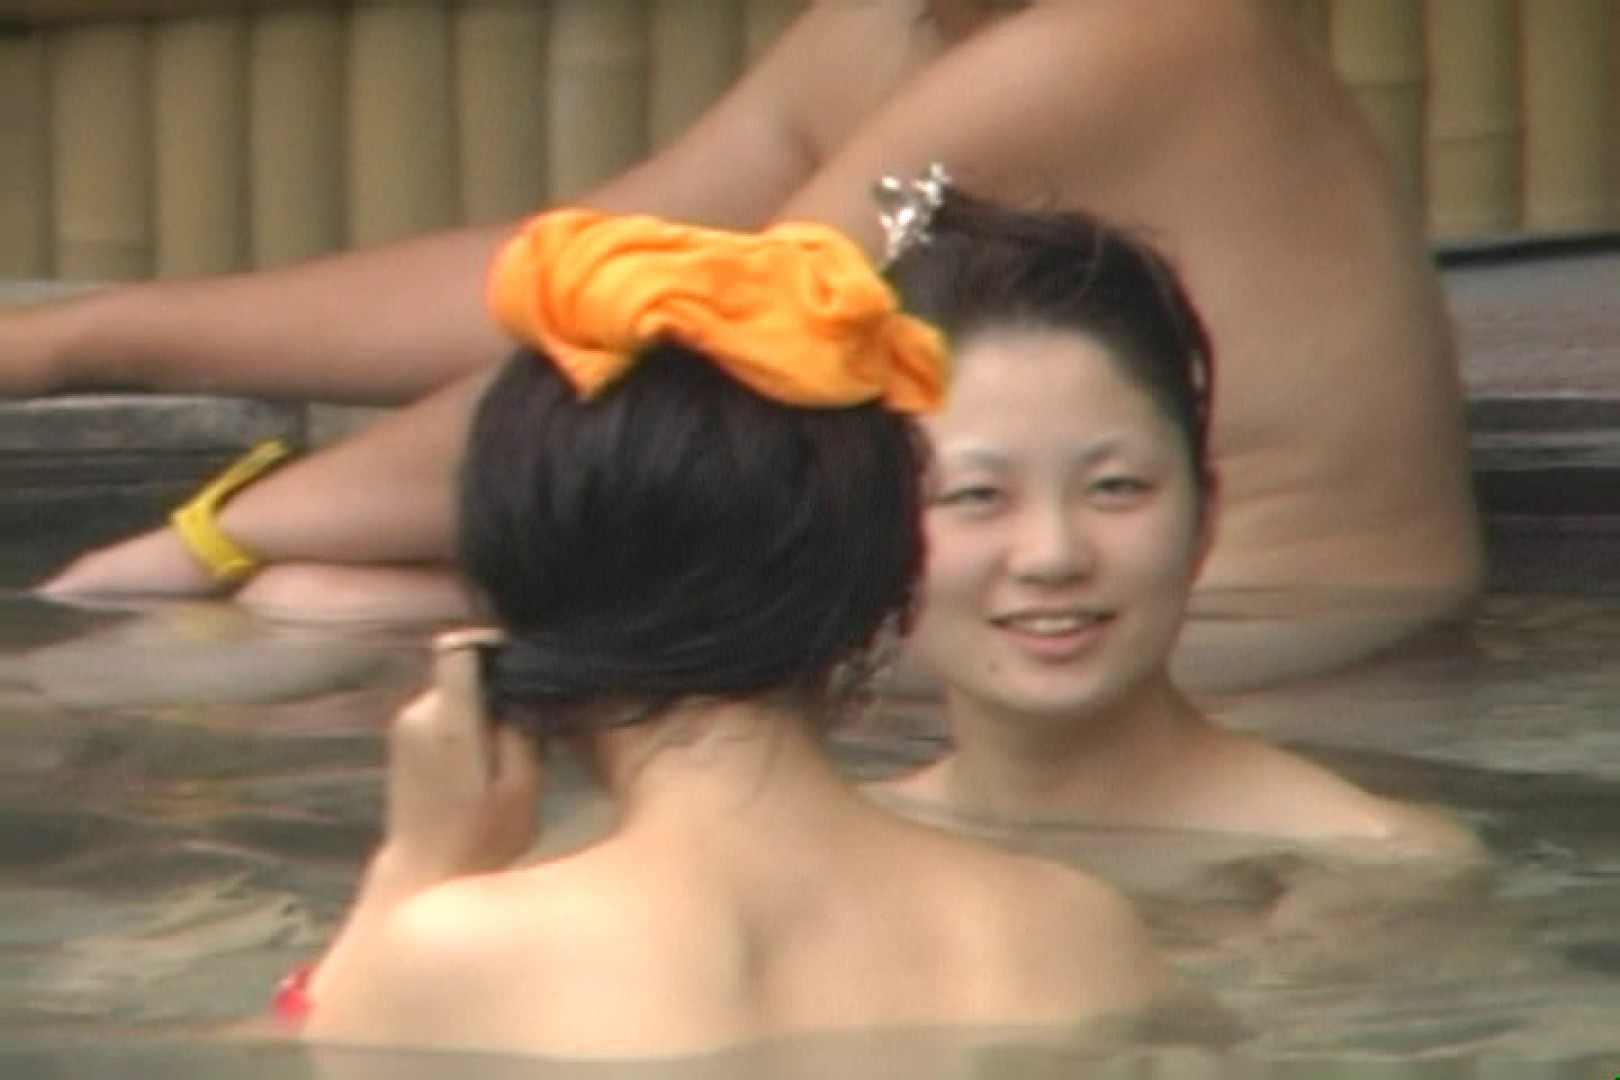 Aquaな露天風呂Vol.40【VIP】 盗撮 | OLセックス  66画像 4